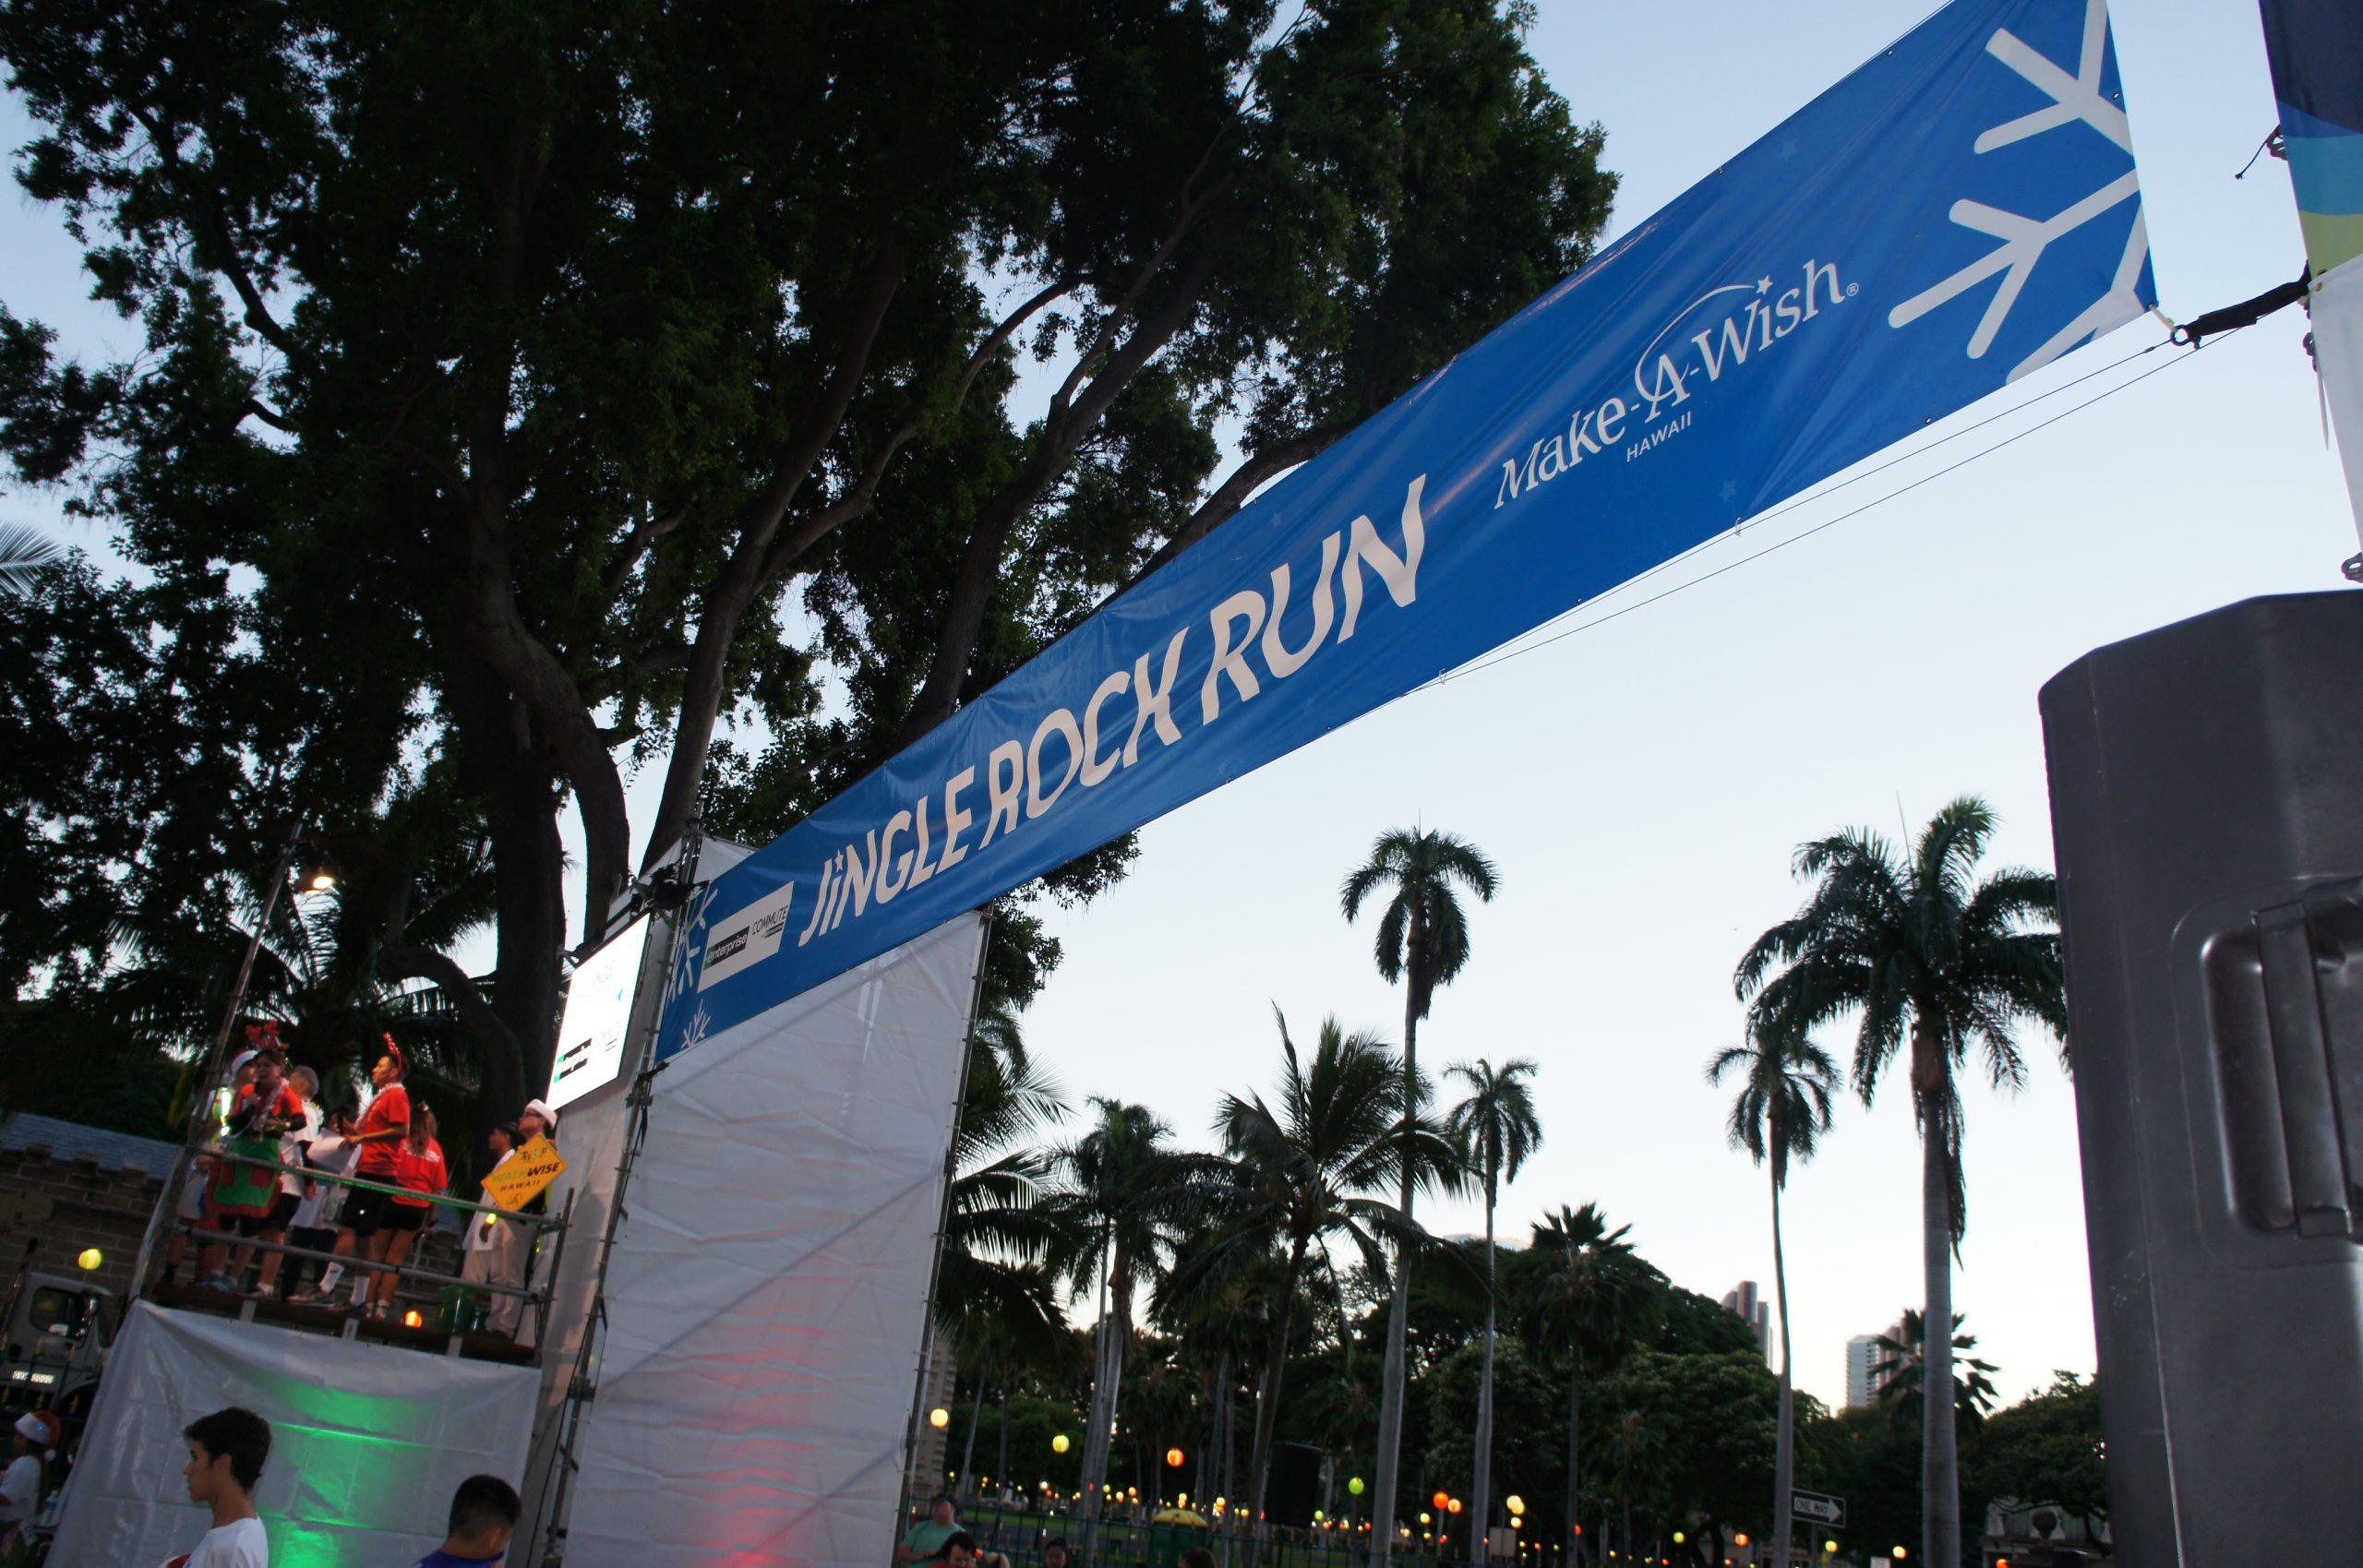 Jingle Rock Run banner at the beginning of run.